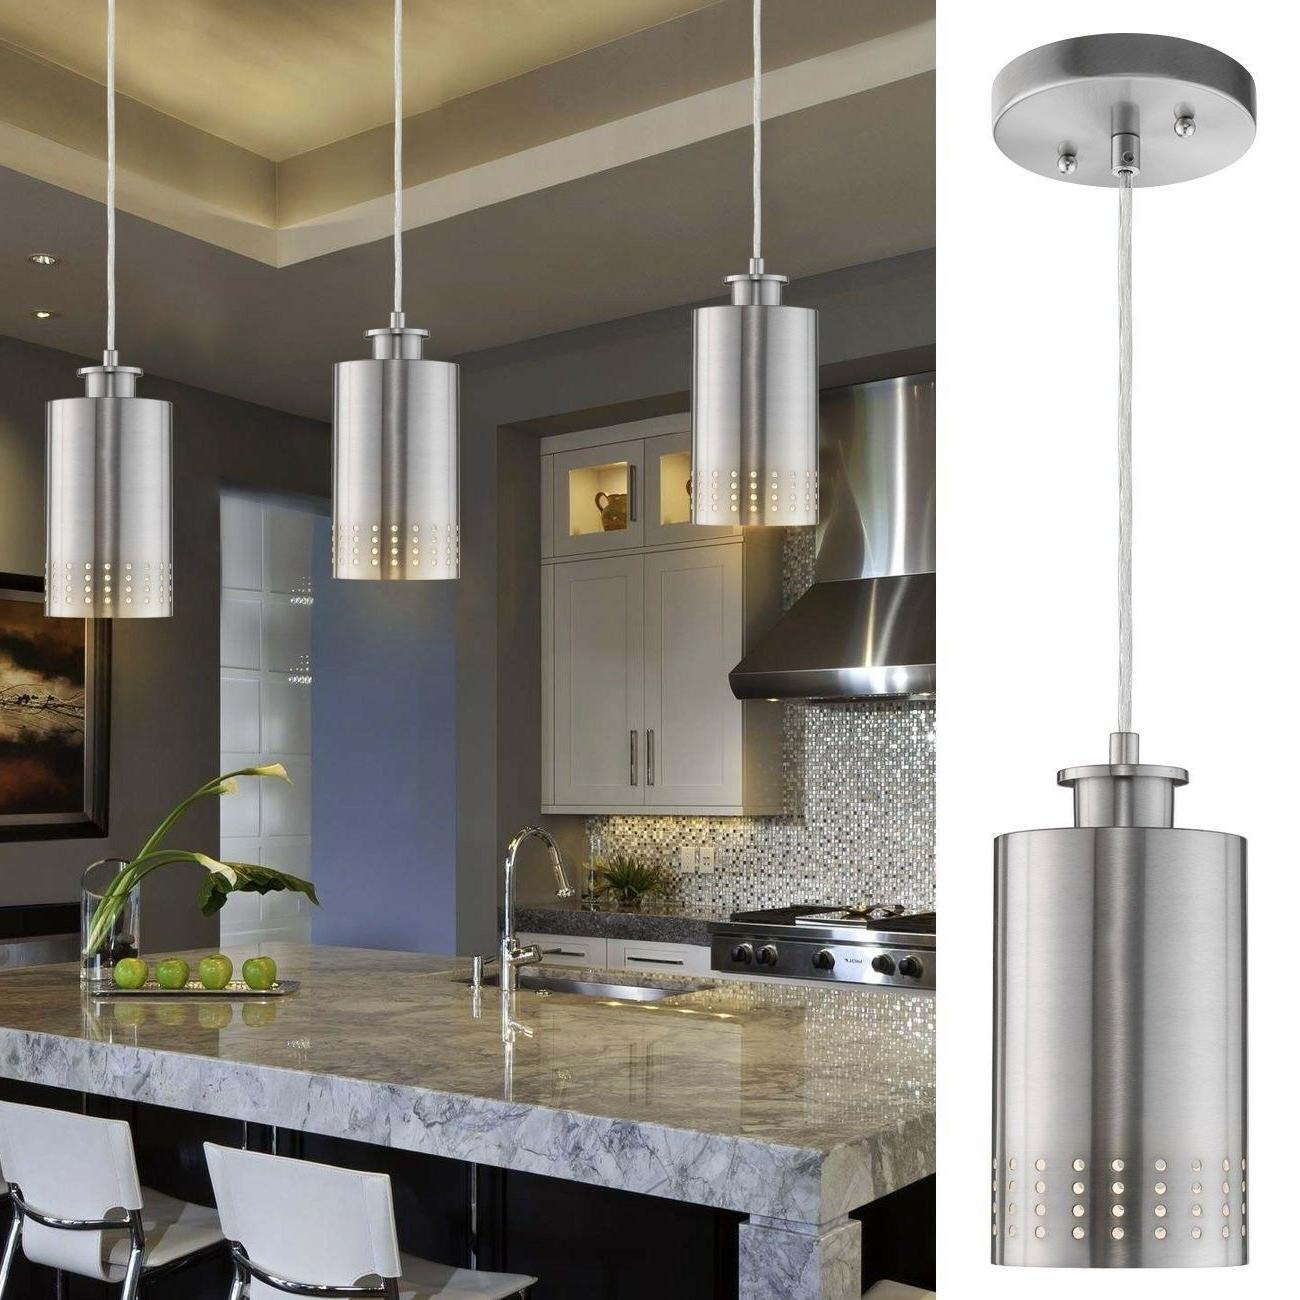 Kitchen Island Pendant Light Fixture Modern Hanging Ceiling